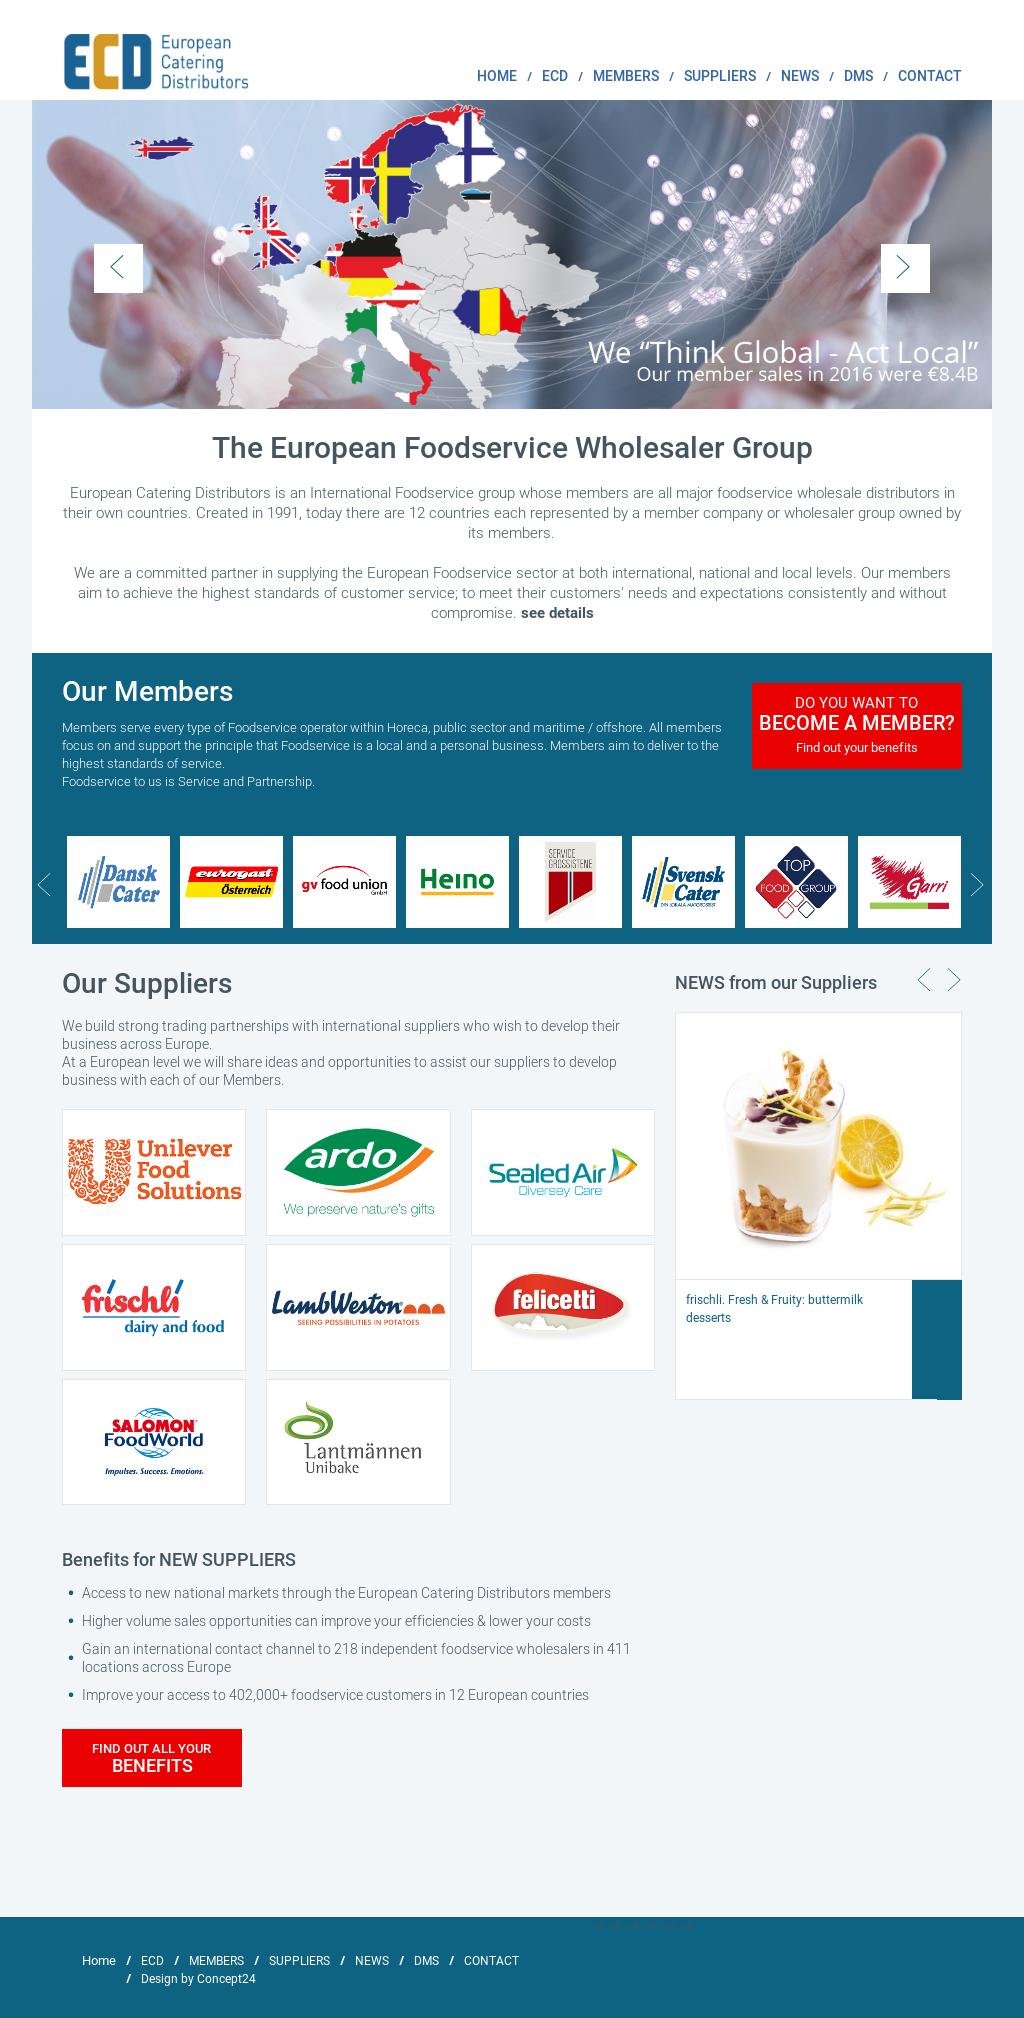 Ecd European Catering Distributors Competitors, Revenue and